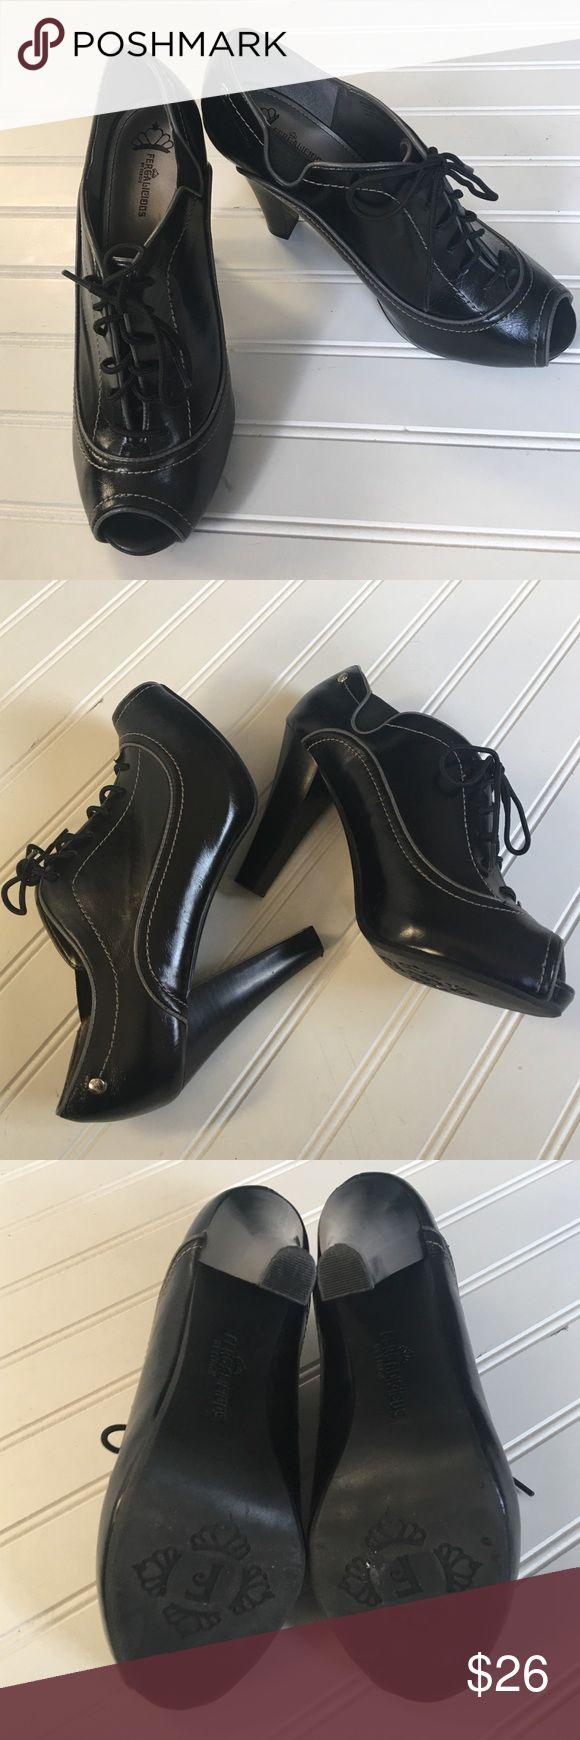 "❤SALE -NWOB Fergalicious Heels Sexy lace up peep toe shoes - 4"" heel Fergie Shoes Heels"